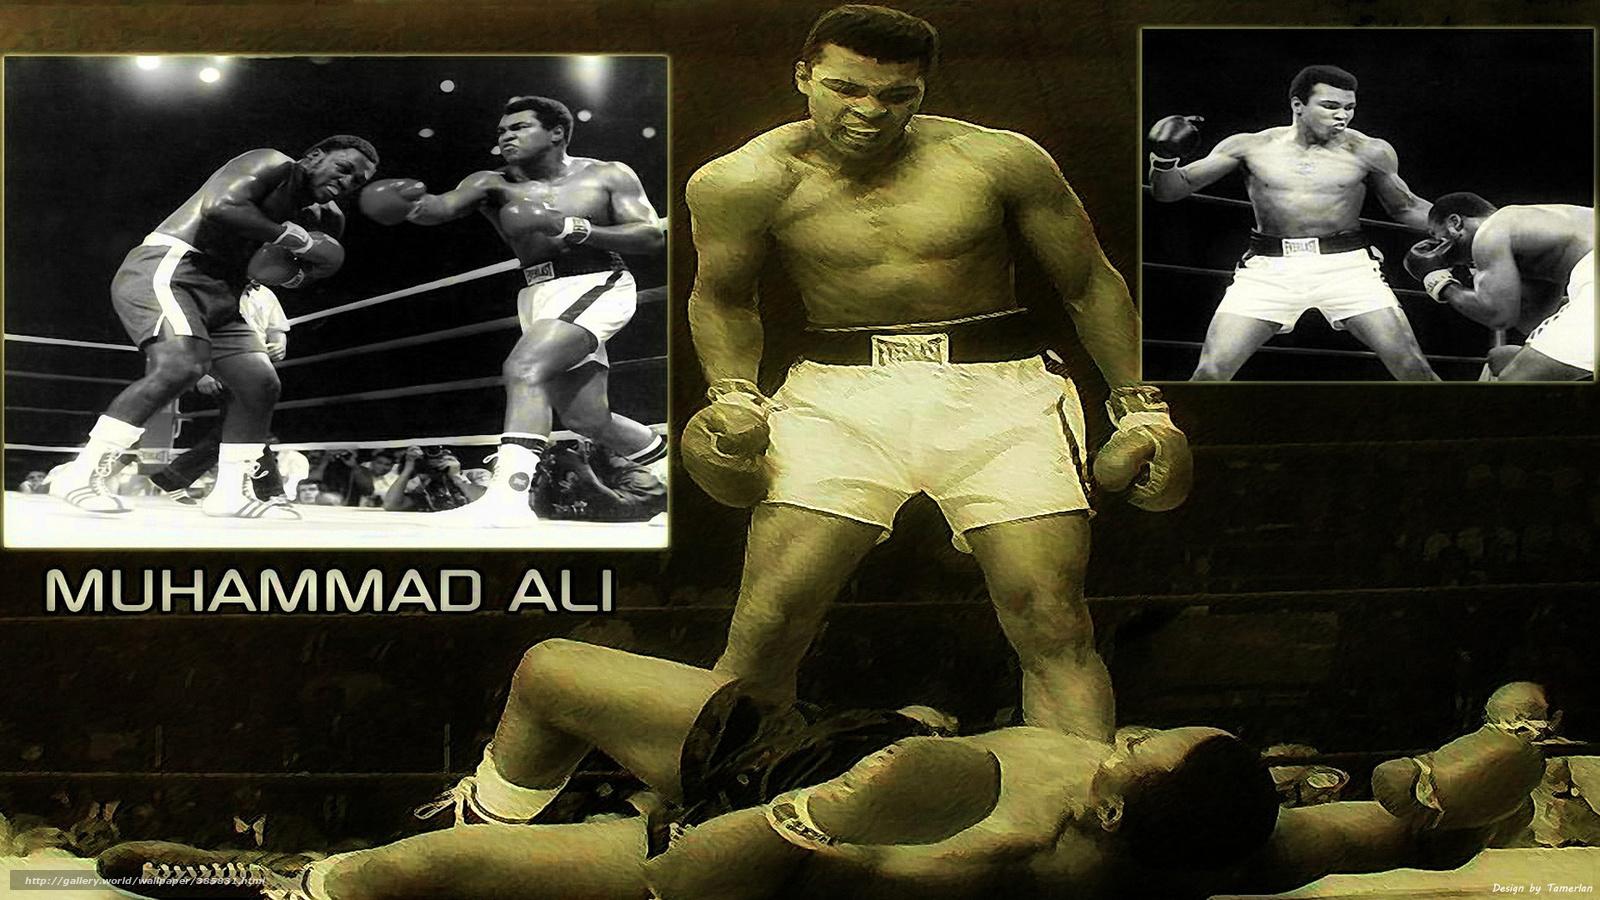 Muhammad Ali Wallpaper 1920x1080